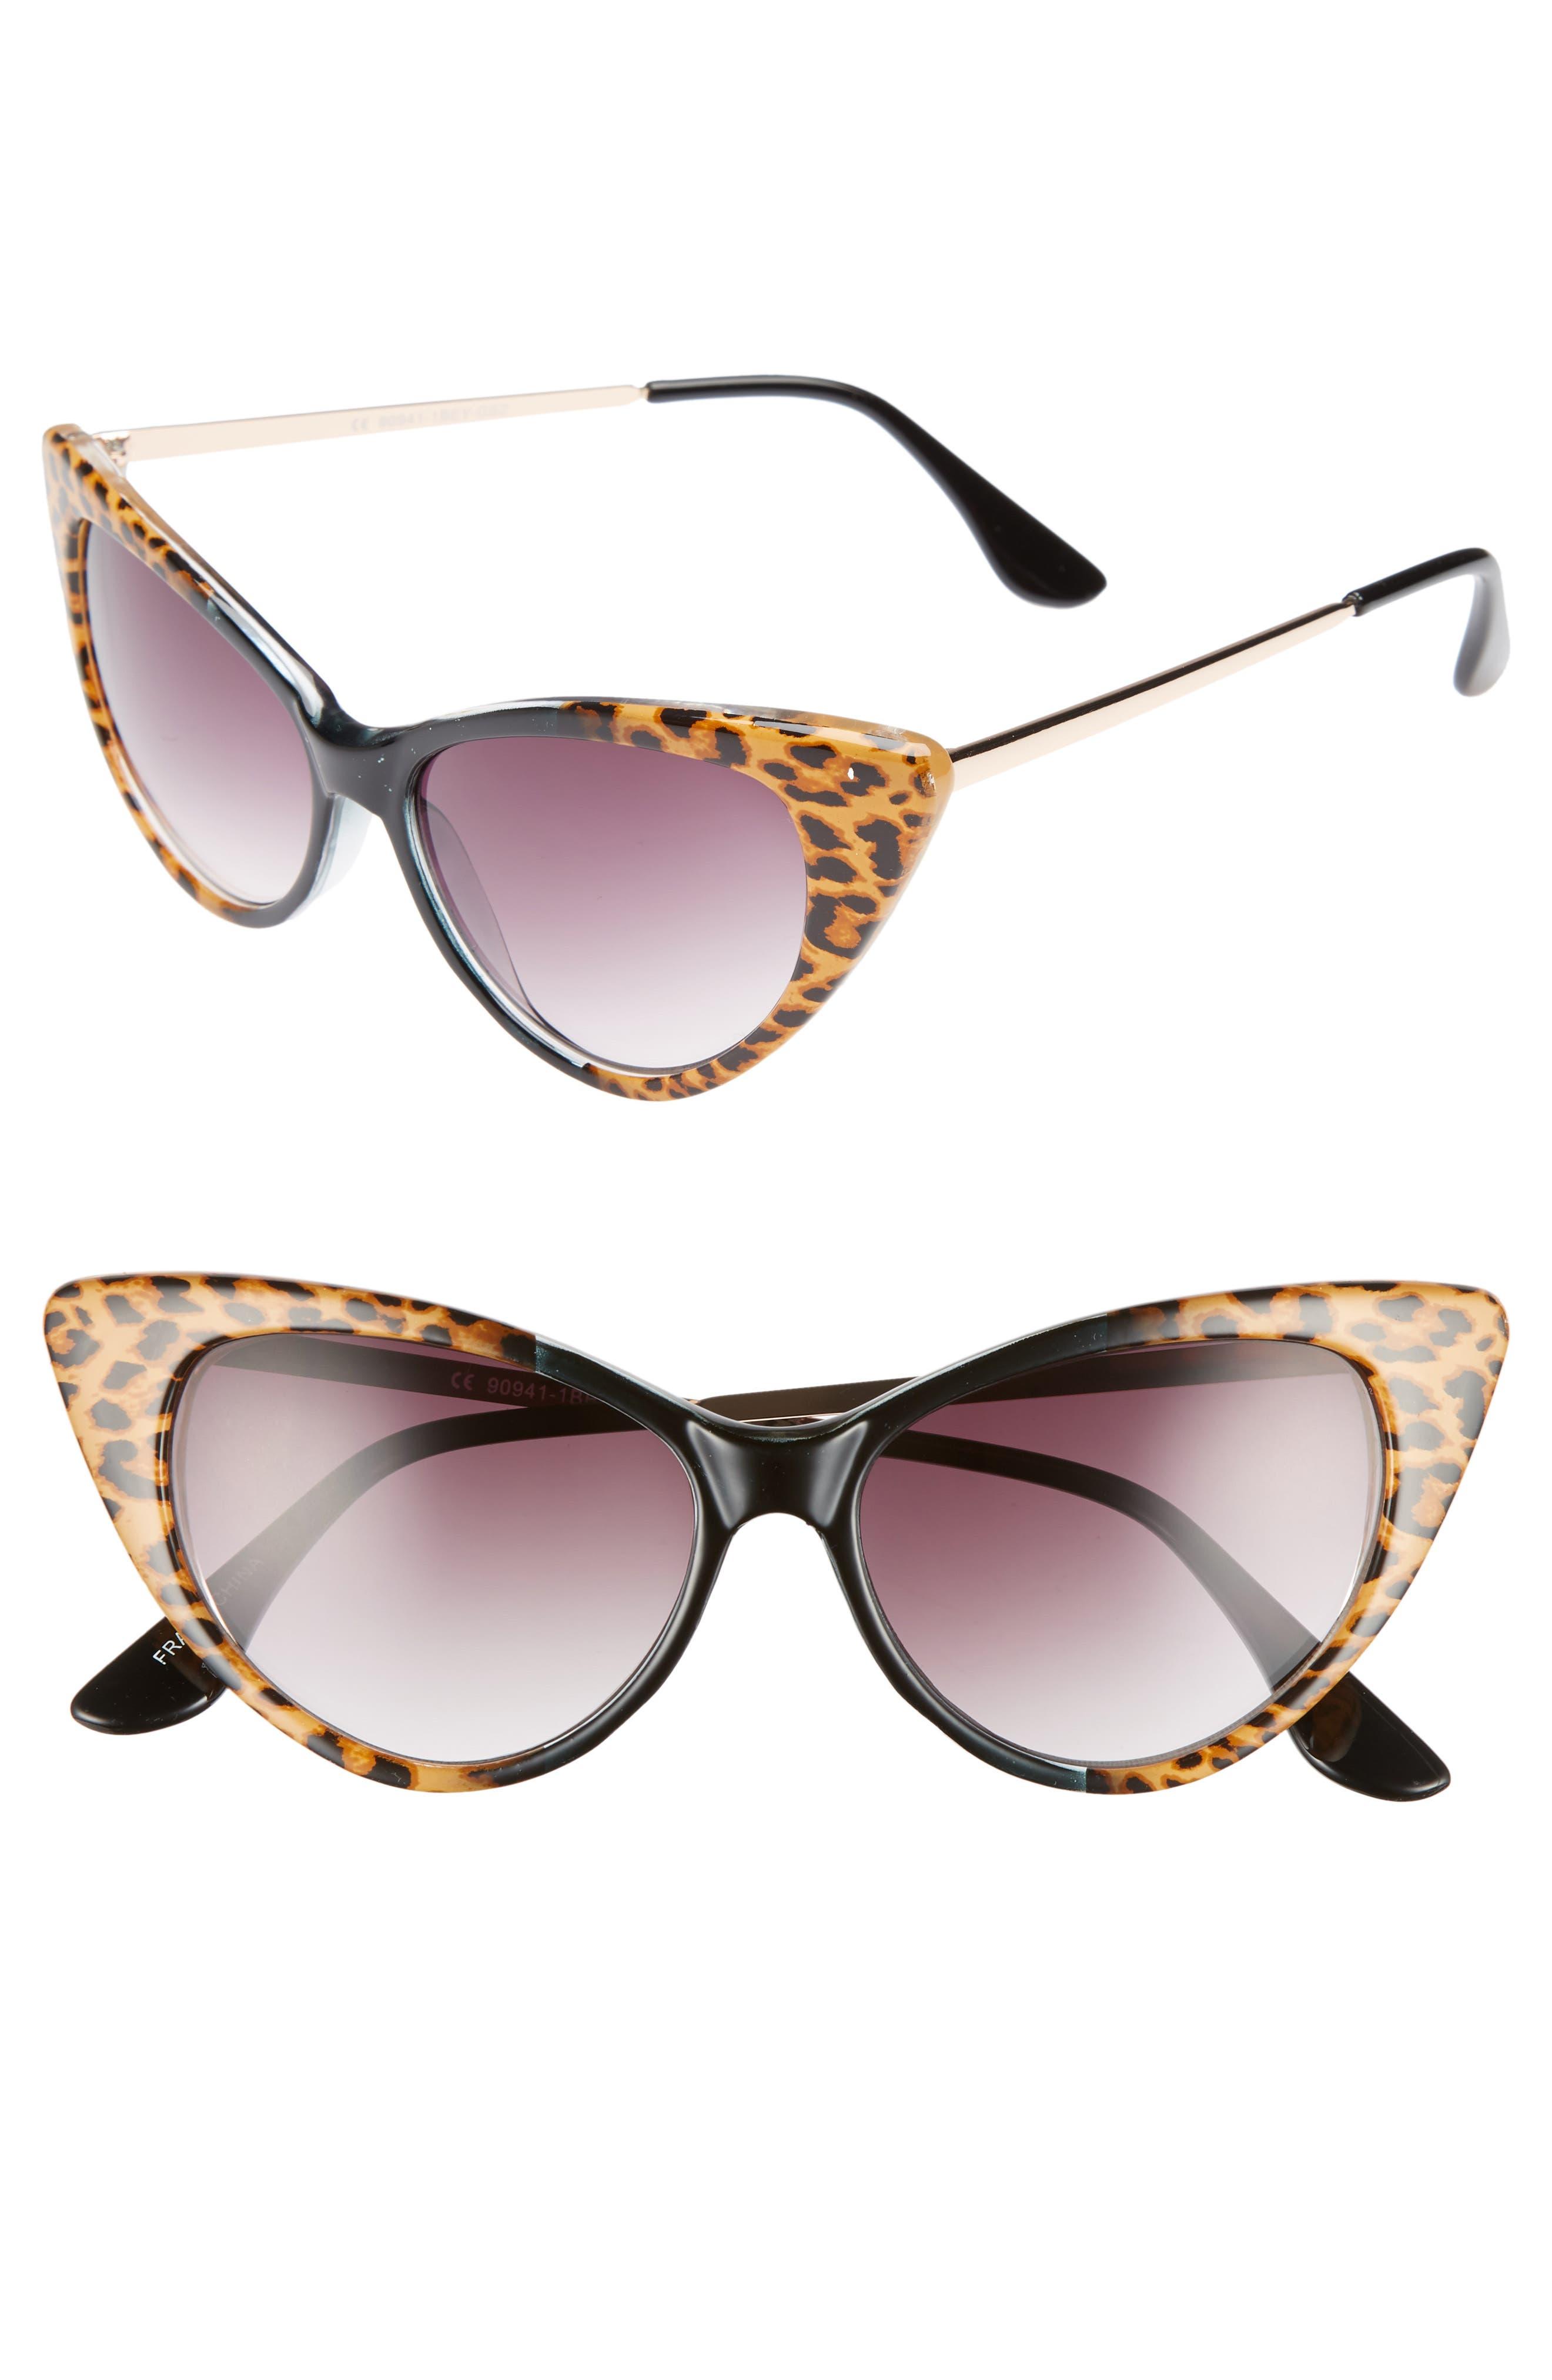 62mm Leopard Print Cat Eye Sunglasses,                         Main,                         color, Leopard/ Black